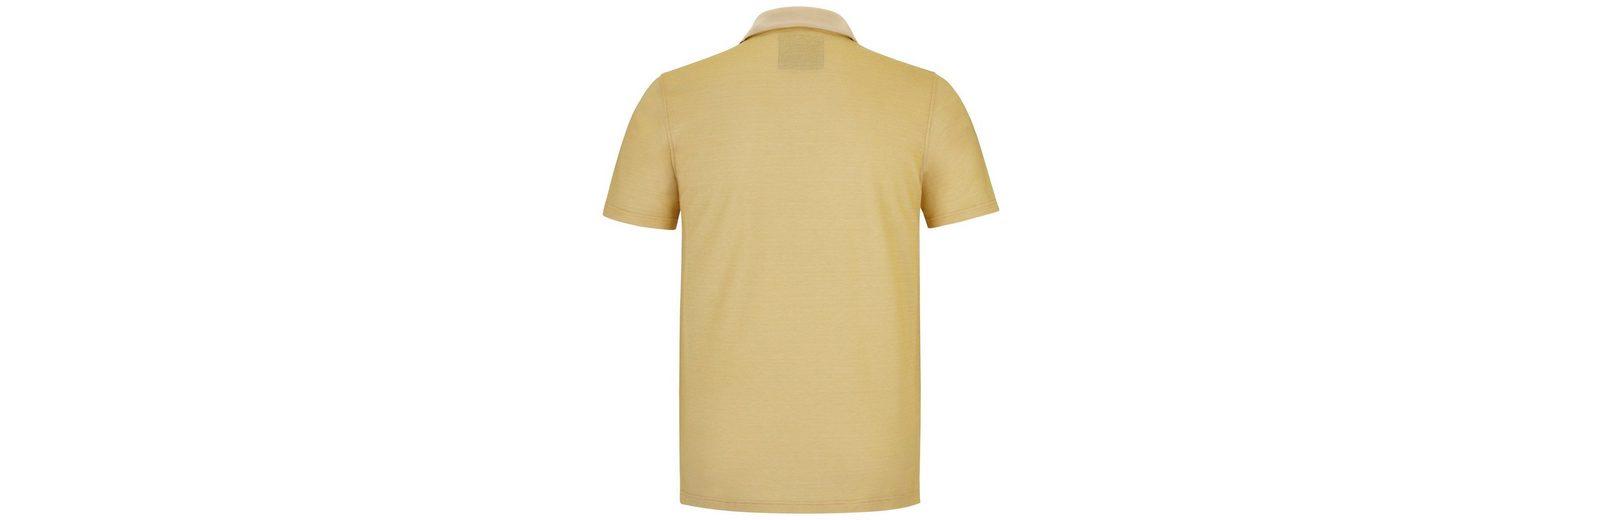 Niedriger Versandverkauf Online Jan Vanderstorm Poloshirt FIONN Billig Großer Verkauf Mode Online-Verkauf Billig Verkauf Wahl Günstig Kaufen 100% Authentisch P5r3E